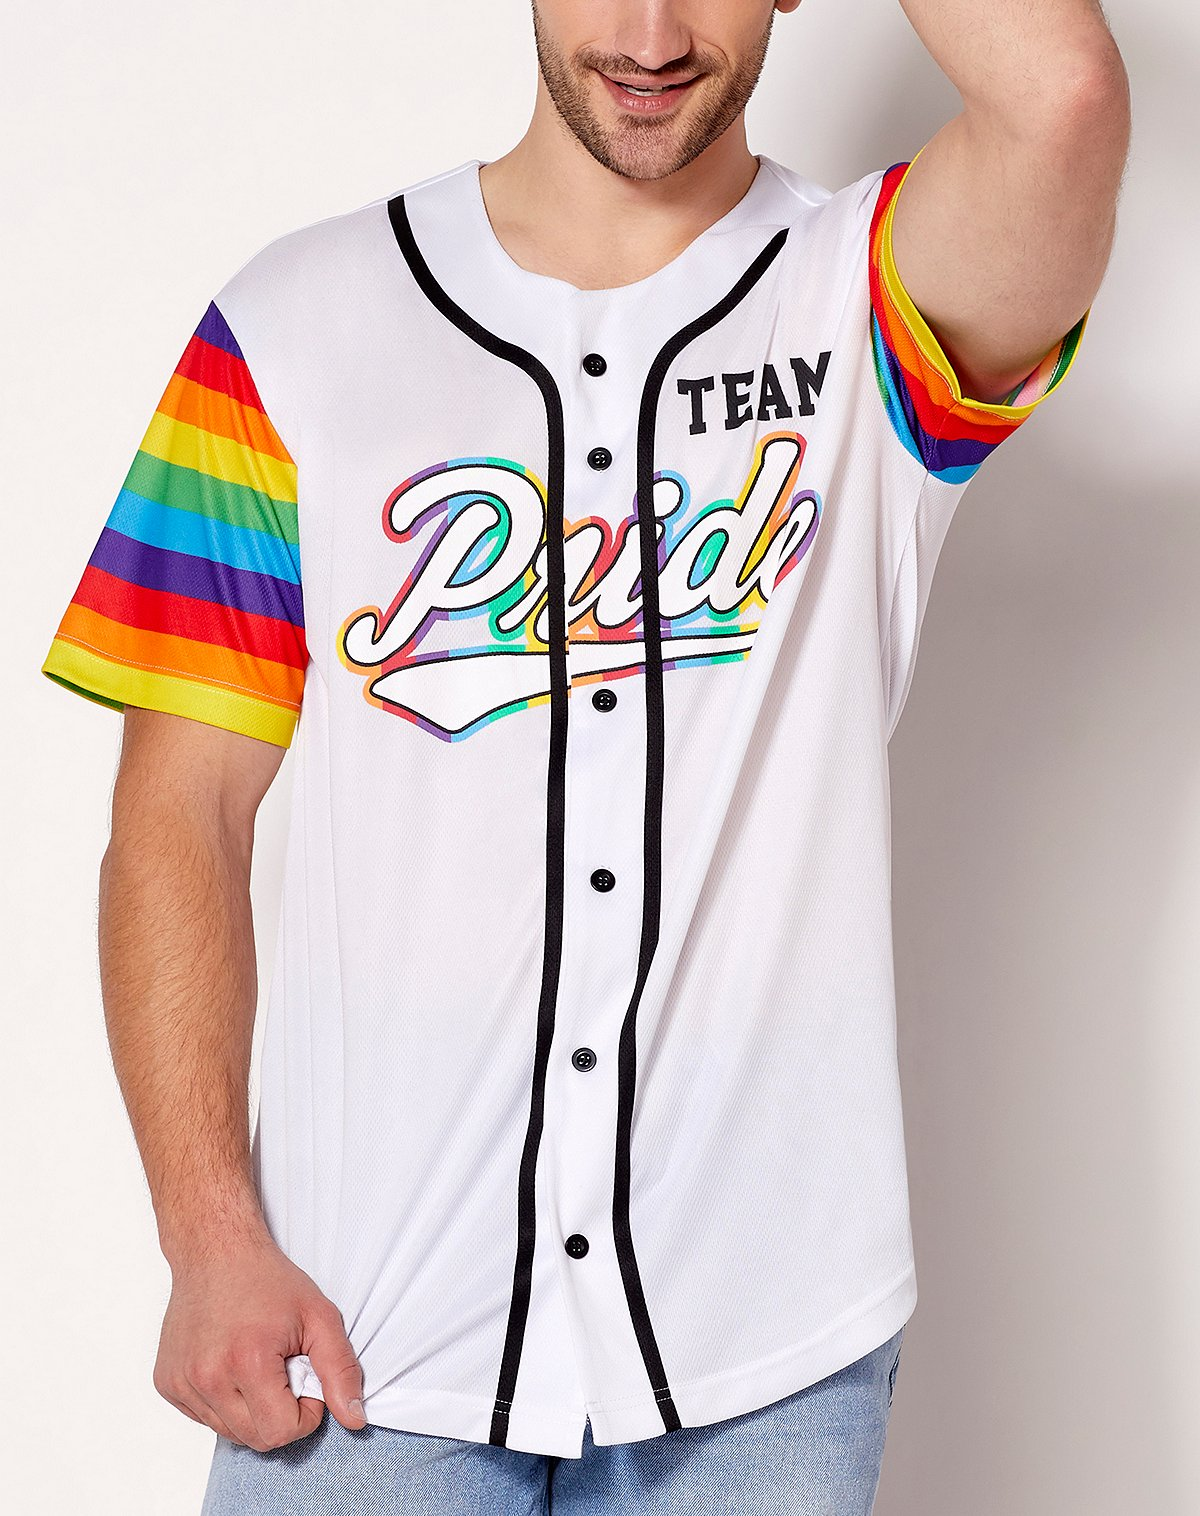 Team Pride Jersey